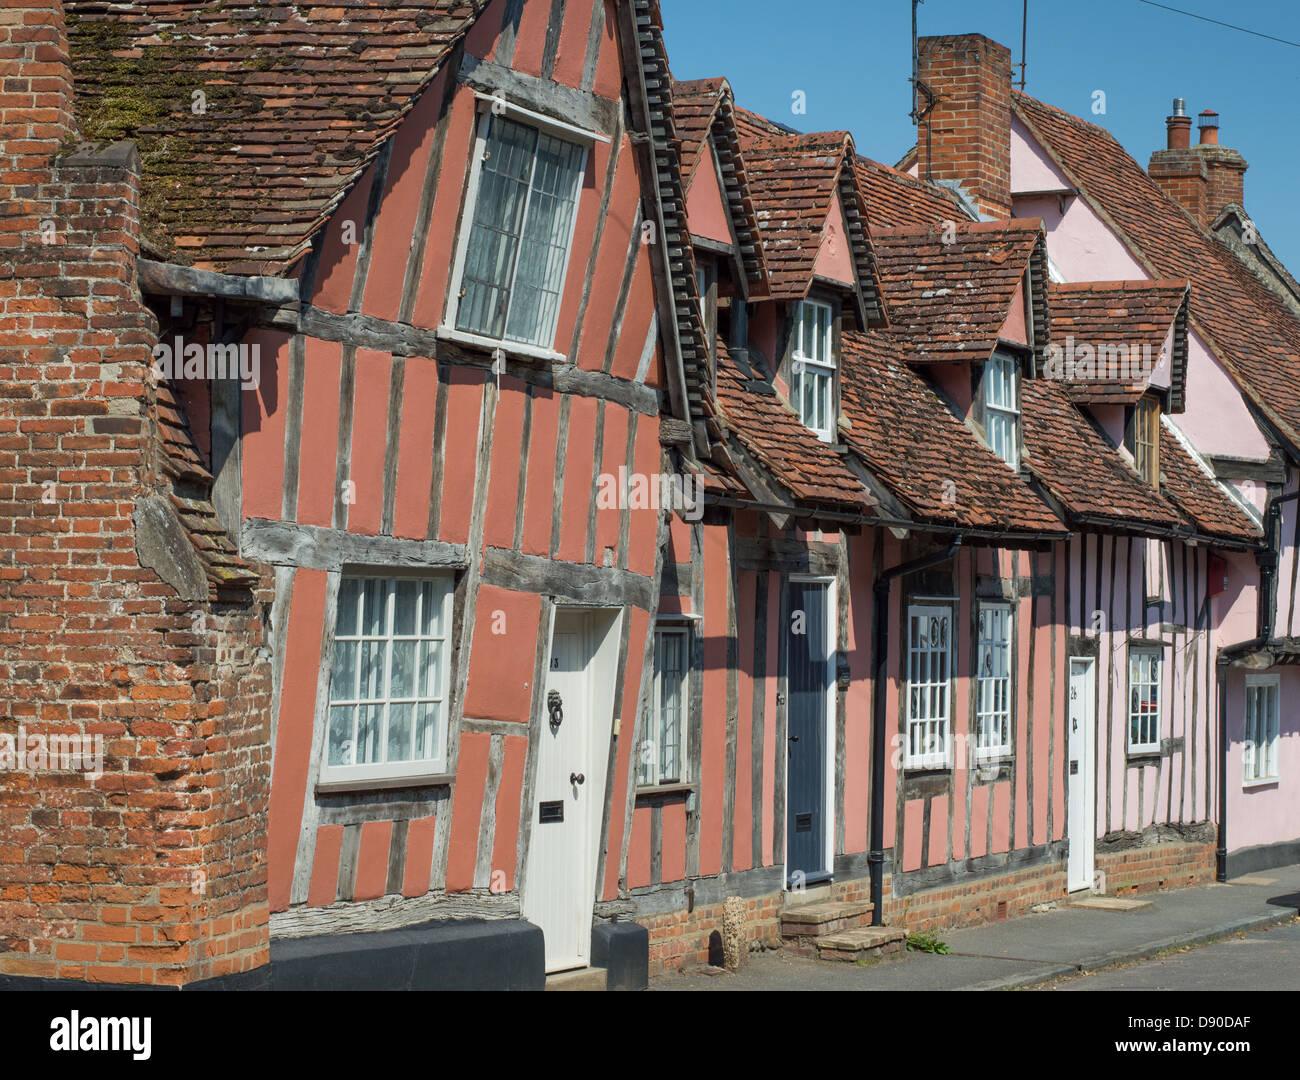 UK England Suffolk Lavenham: timber-framed medieval houses, exterior. - Stock Image